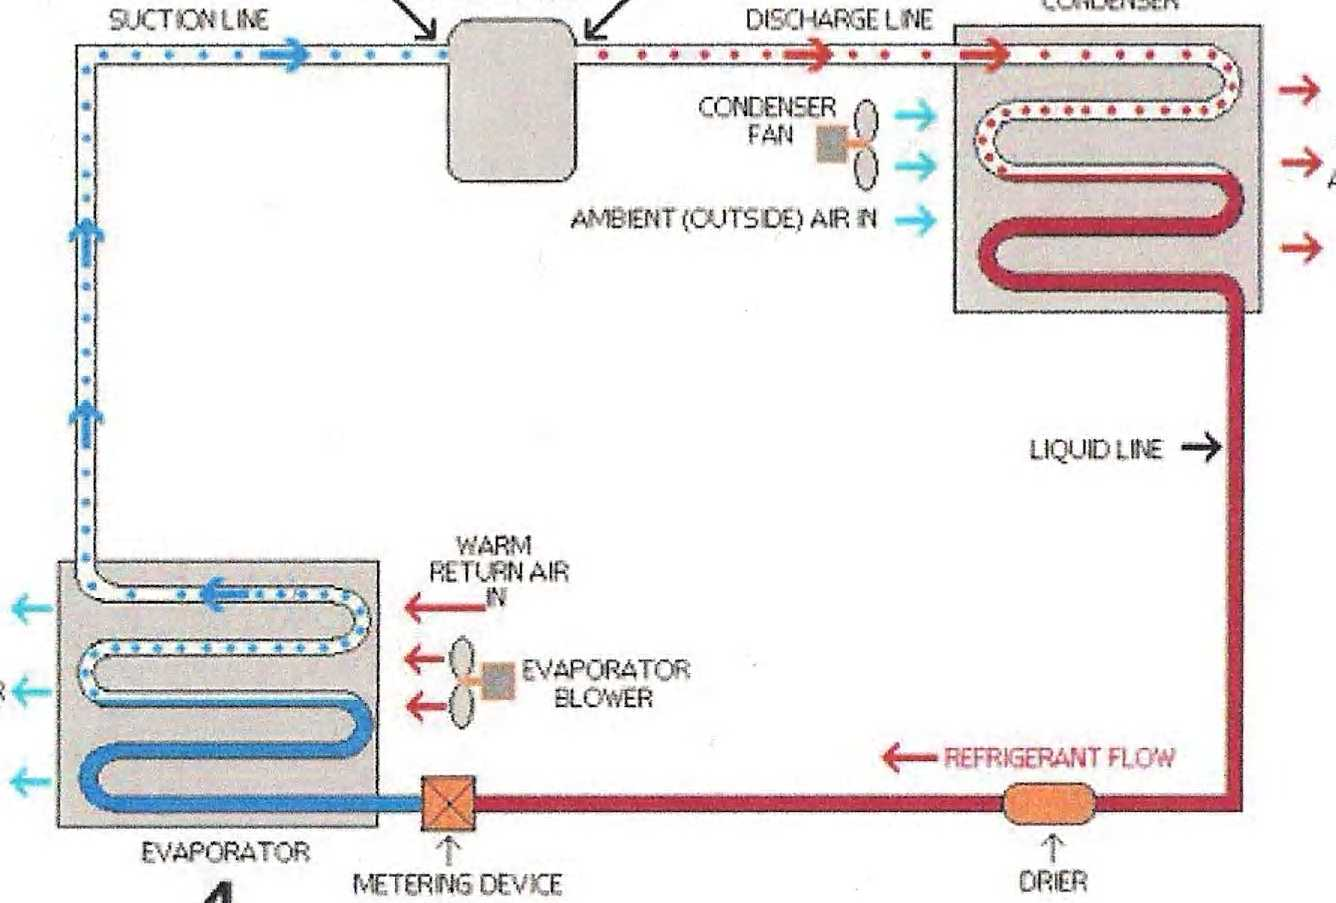 wiring diagram of refrigeration system bathtub drain assembly heat pump refrigerant circuit get free